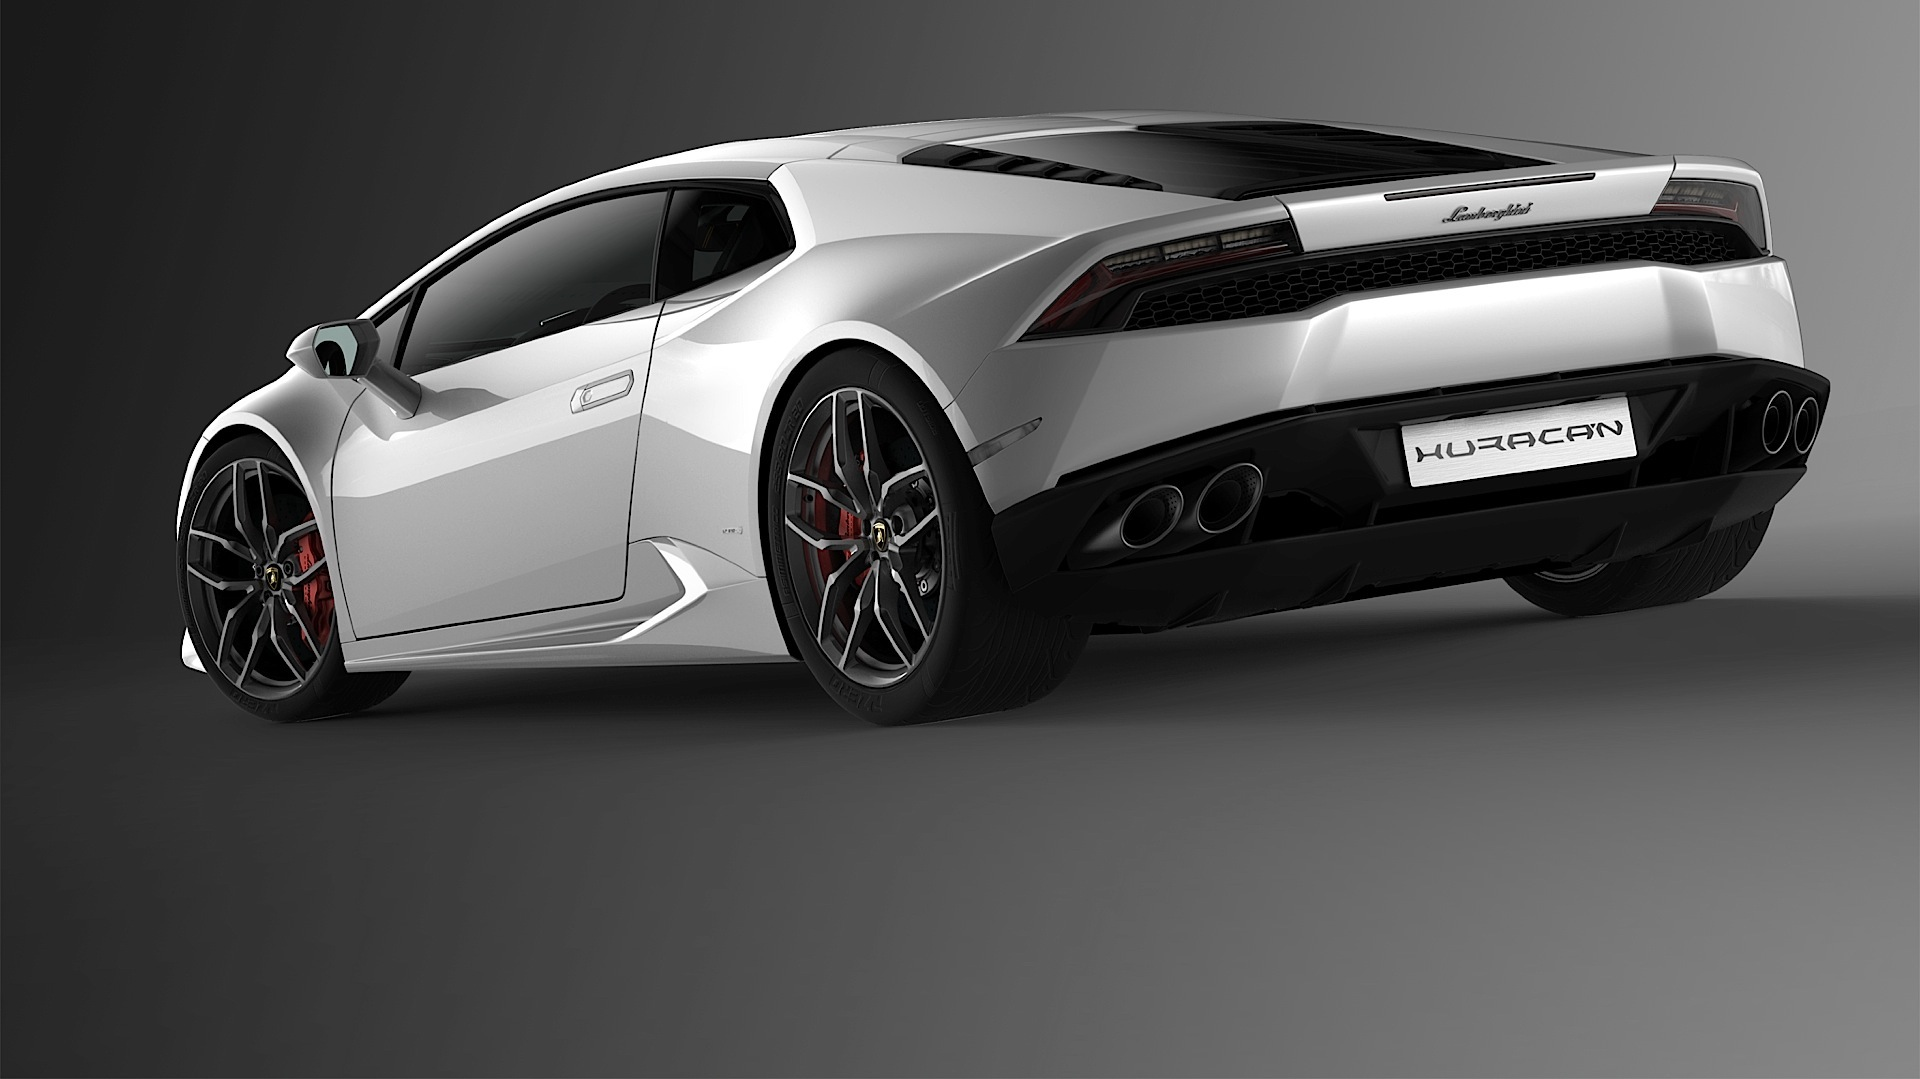 LAMBORGHINI-Huracan-LP-610-4-5078_5 Mesmerizing Lamborghini Huracan Price In south Africa Cars Trend